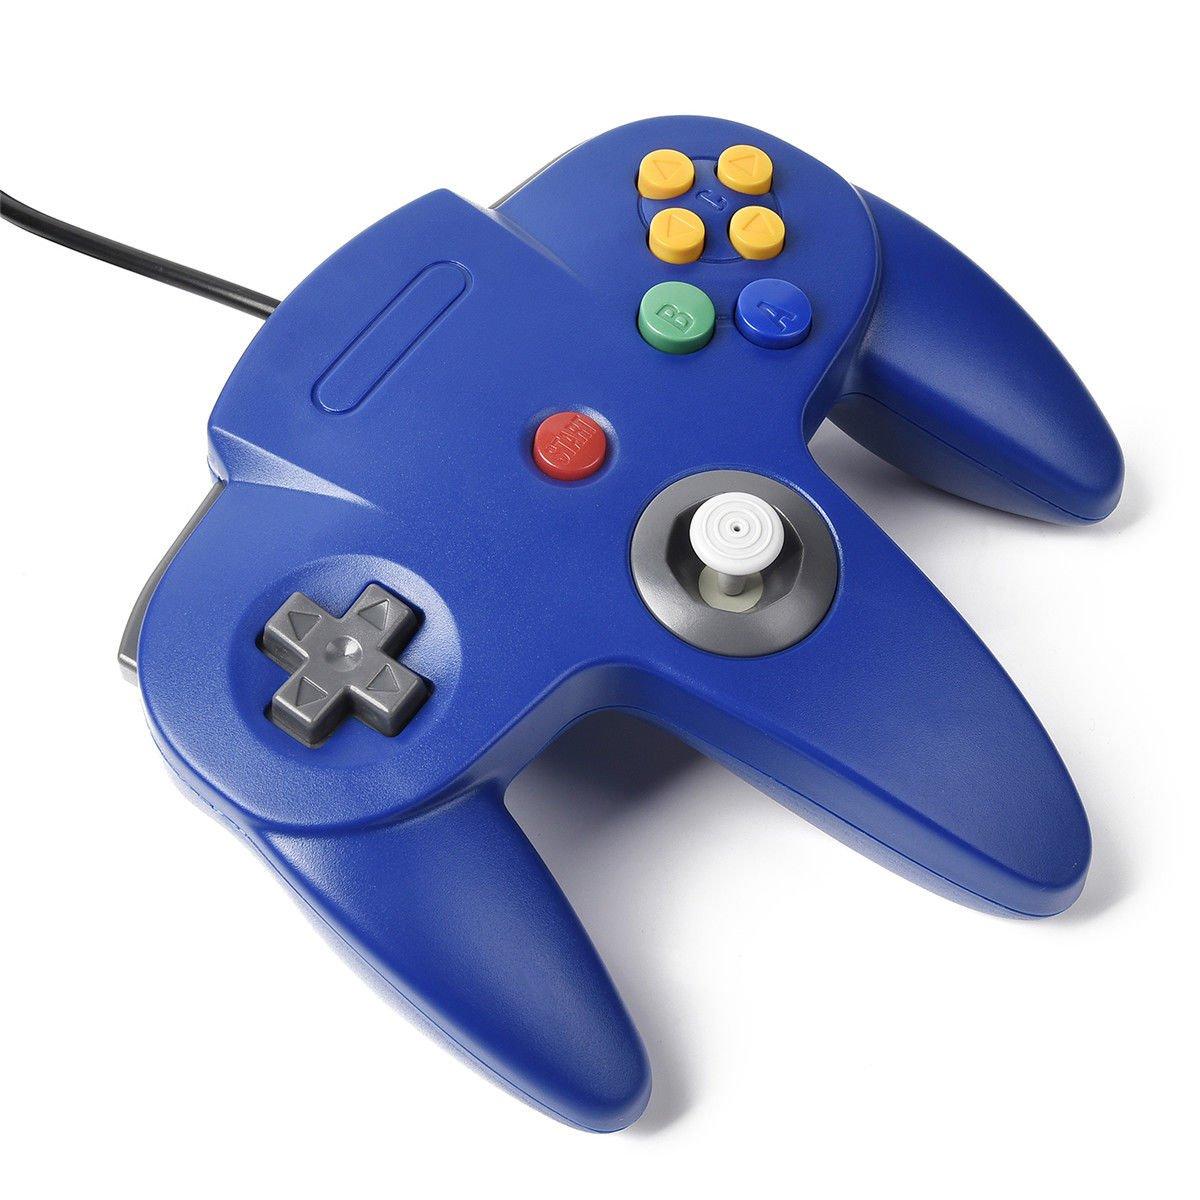 iNNEXT Classic Retro N64 Bit USB Wired Controller for Windows PC MAC Linux Raspberry Pi 3 Blue